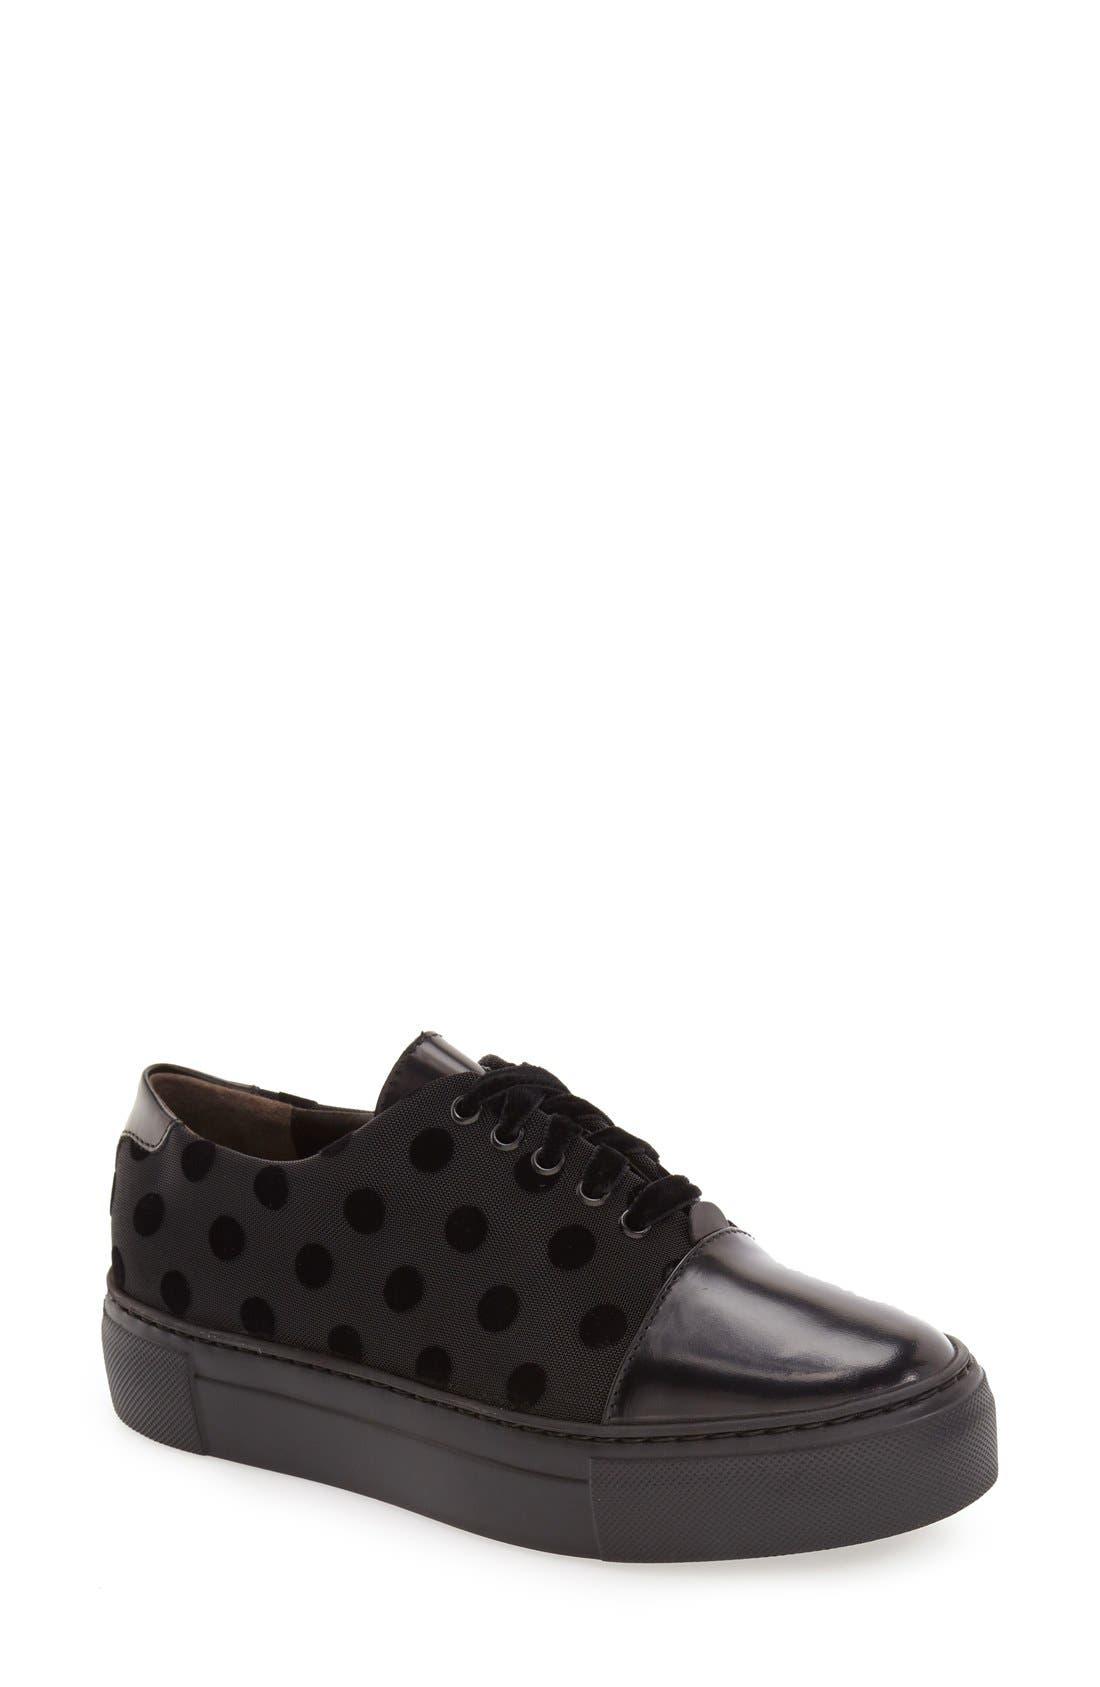 AGL Polka Dot Platform Sneakers outlet wide range of eastbay cheap price shopping online original outlet footlocker uUaRV30